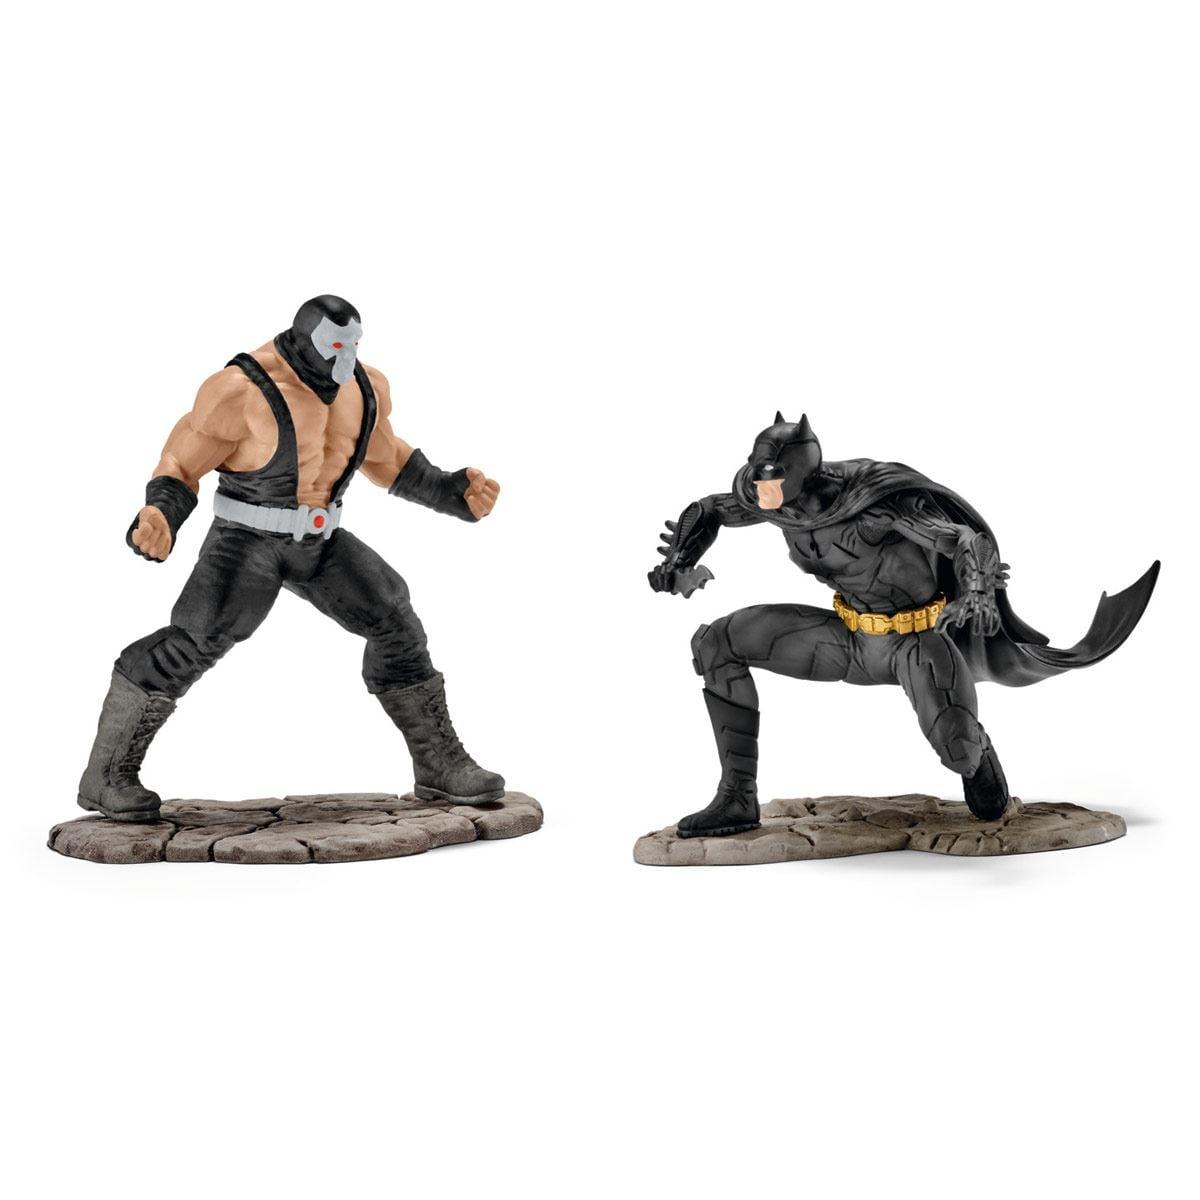 Batman Vs. Bane Coleccionable